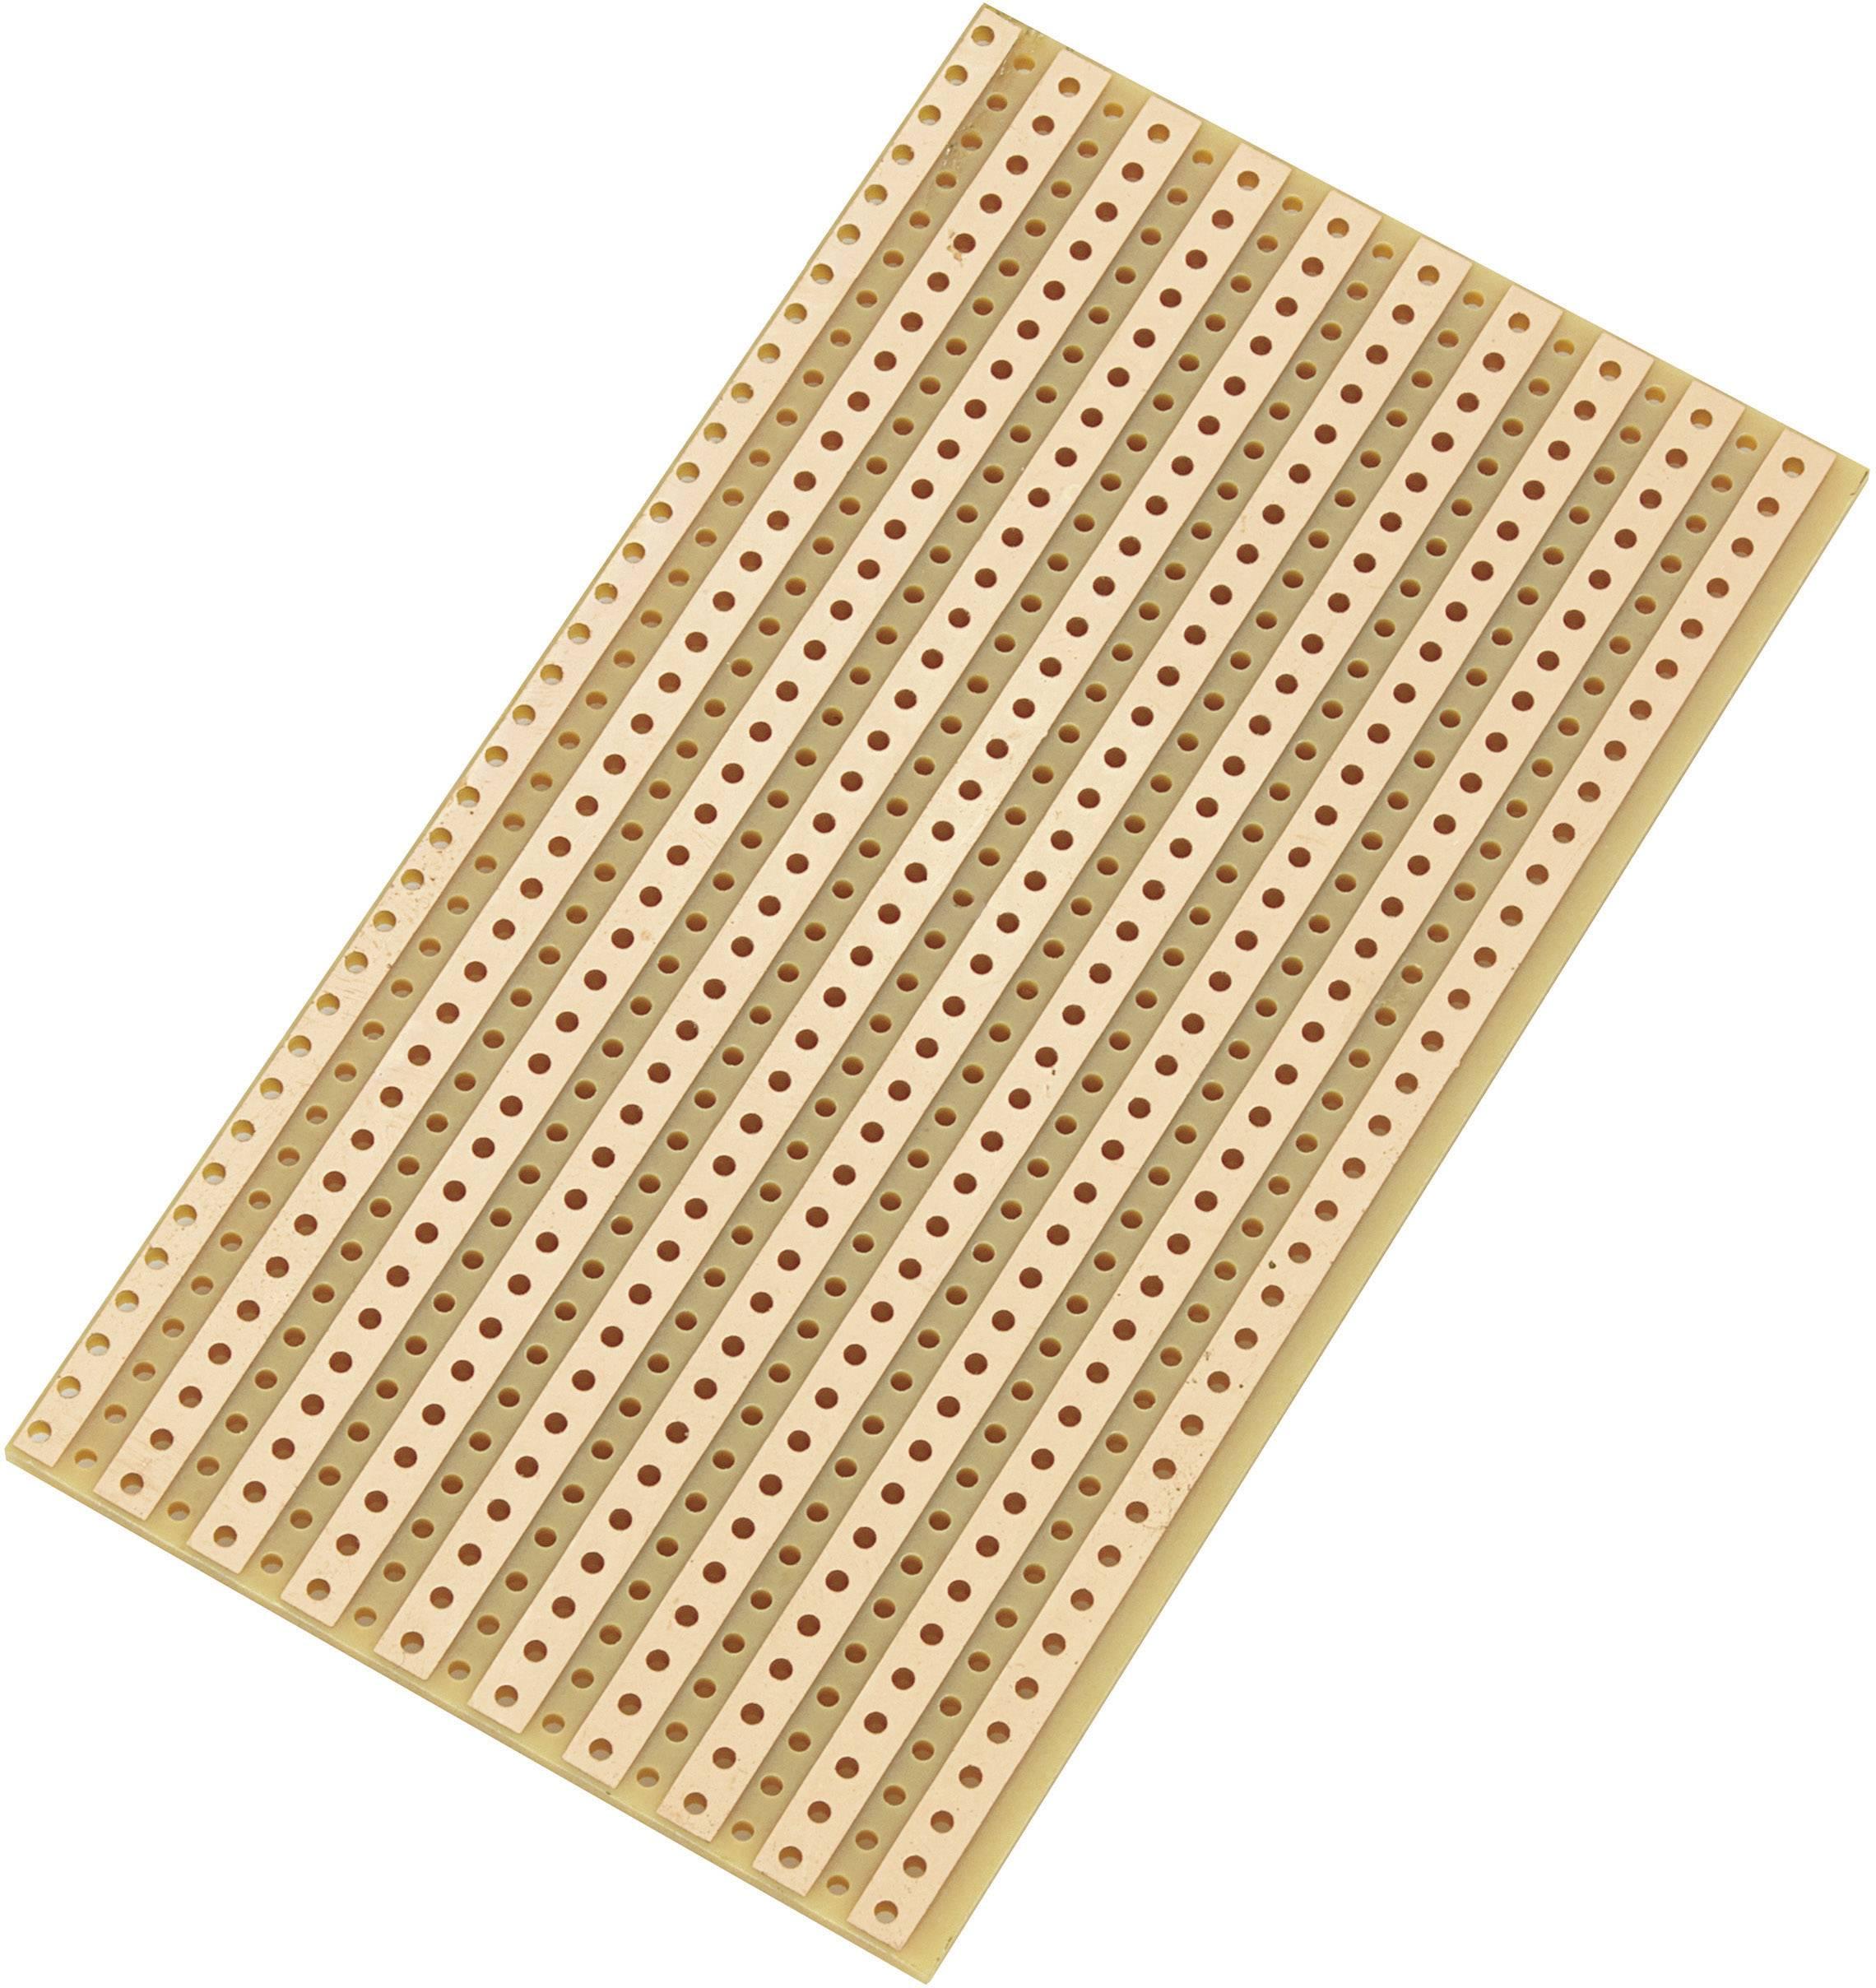 Univerzálna doska s rastrom, SU527610, (D x Š) 90mm x 50mm, rozmery rastra 5,08mm